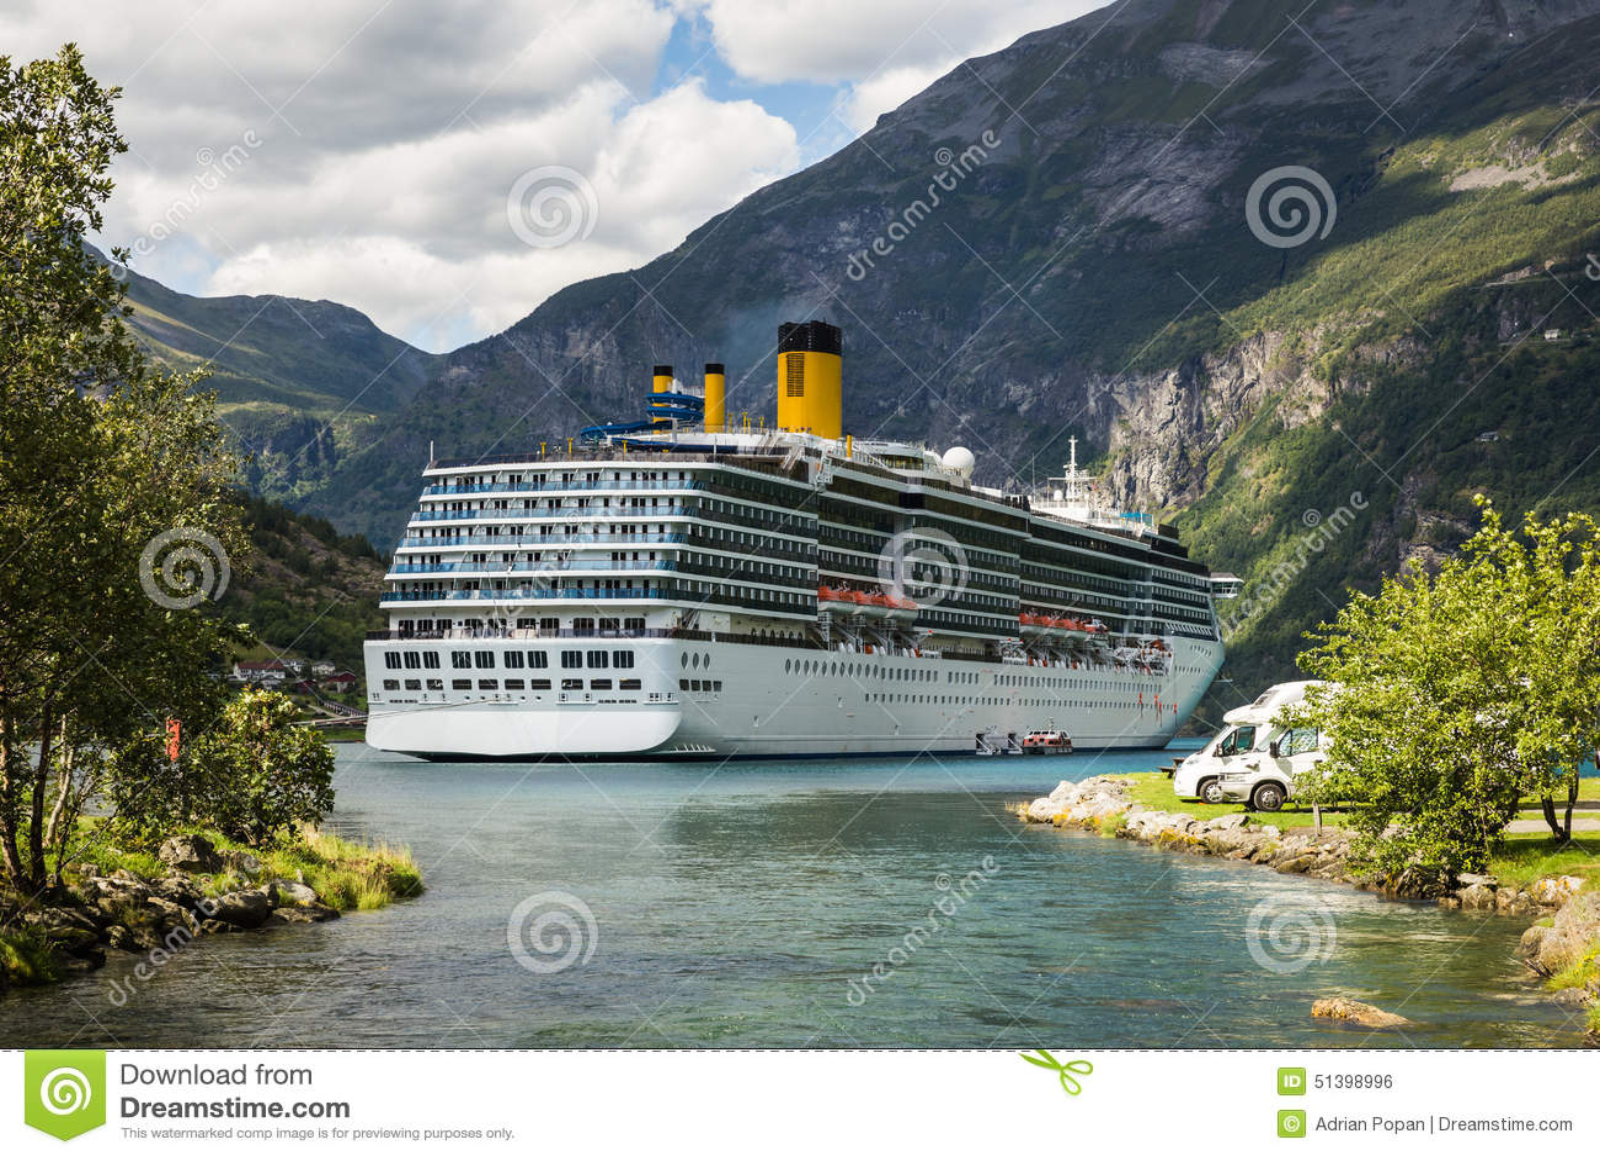 Large Luxury Cruise Ship In Norway Fjords Stock Photo Image - Cruise ship norway